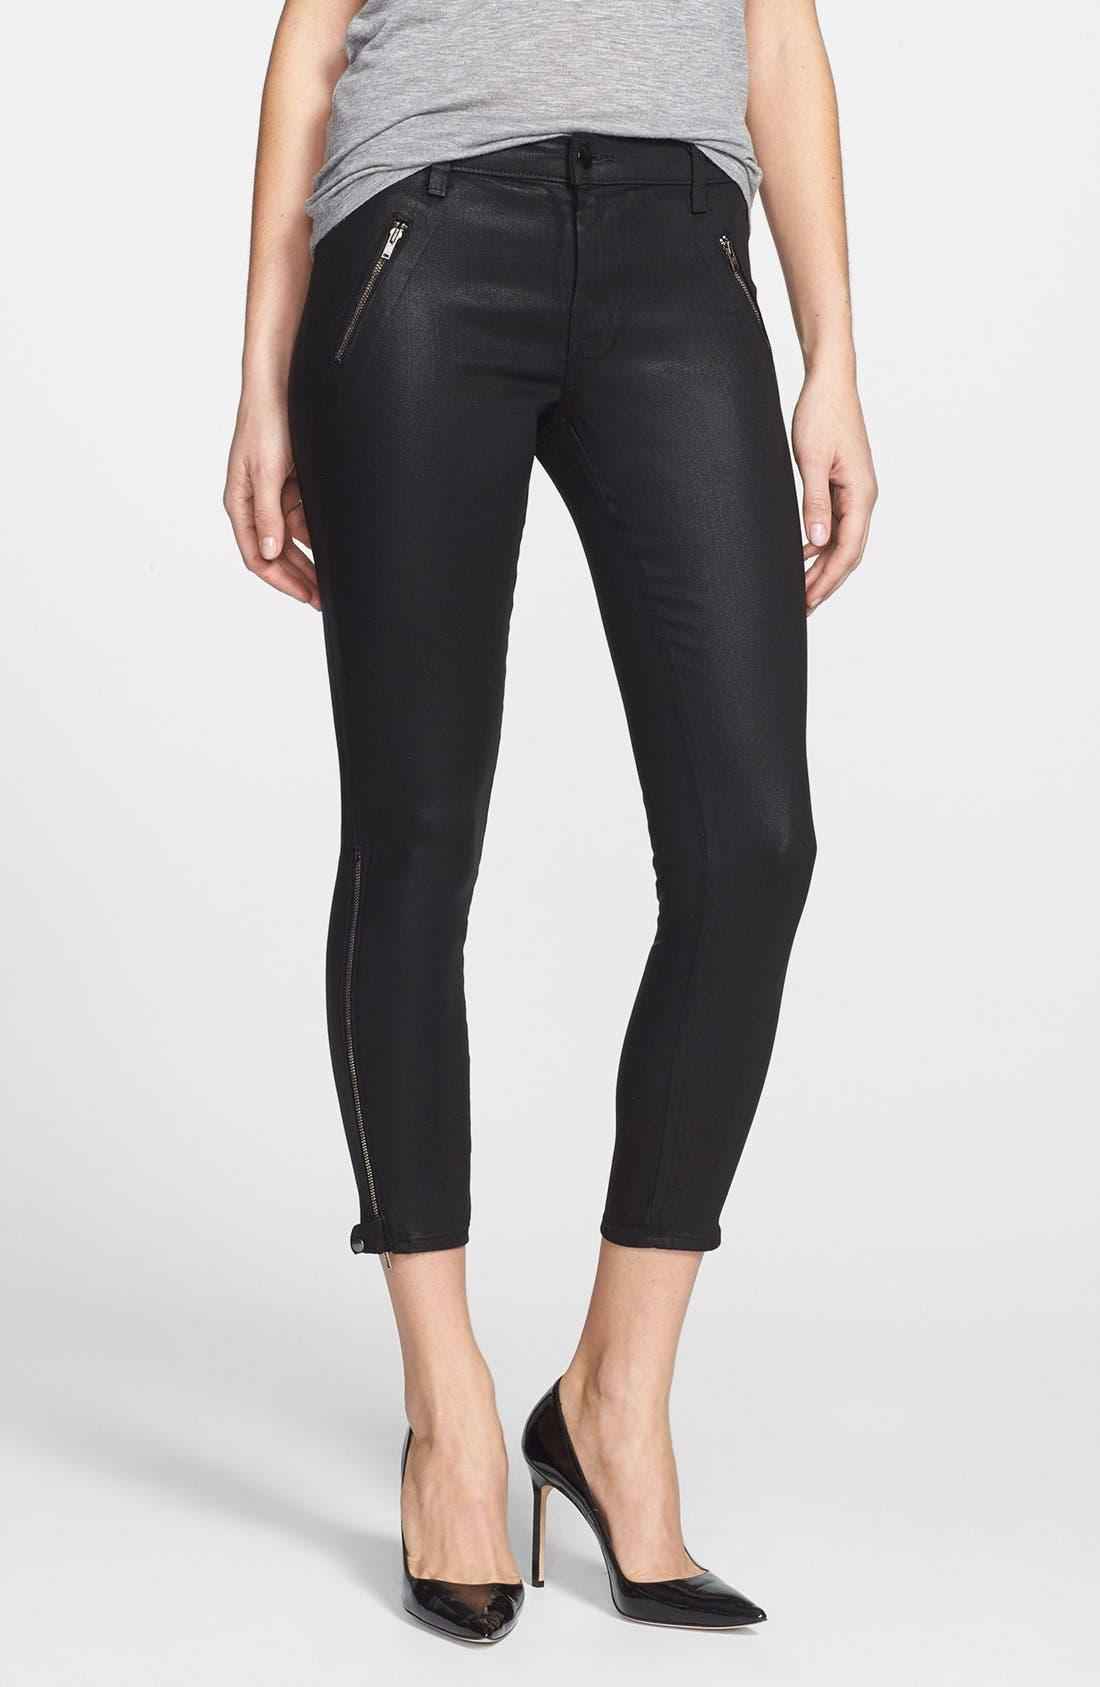 Alternate Image 1 Selected - J Brand '1446 Carey' Moto Skinny Crop Pants (Lacquered Black)